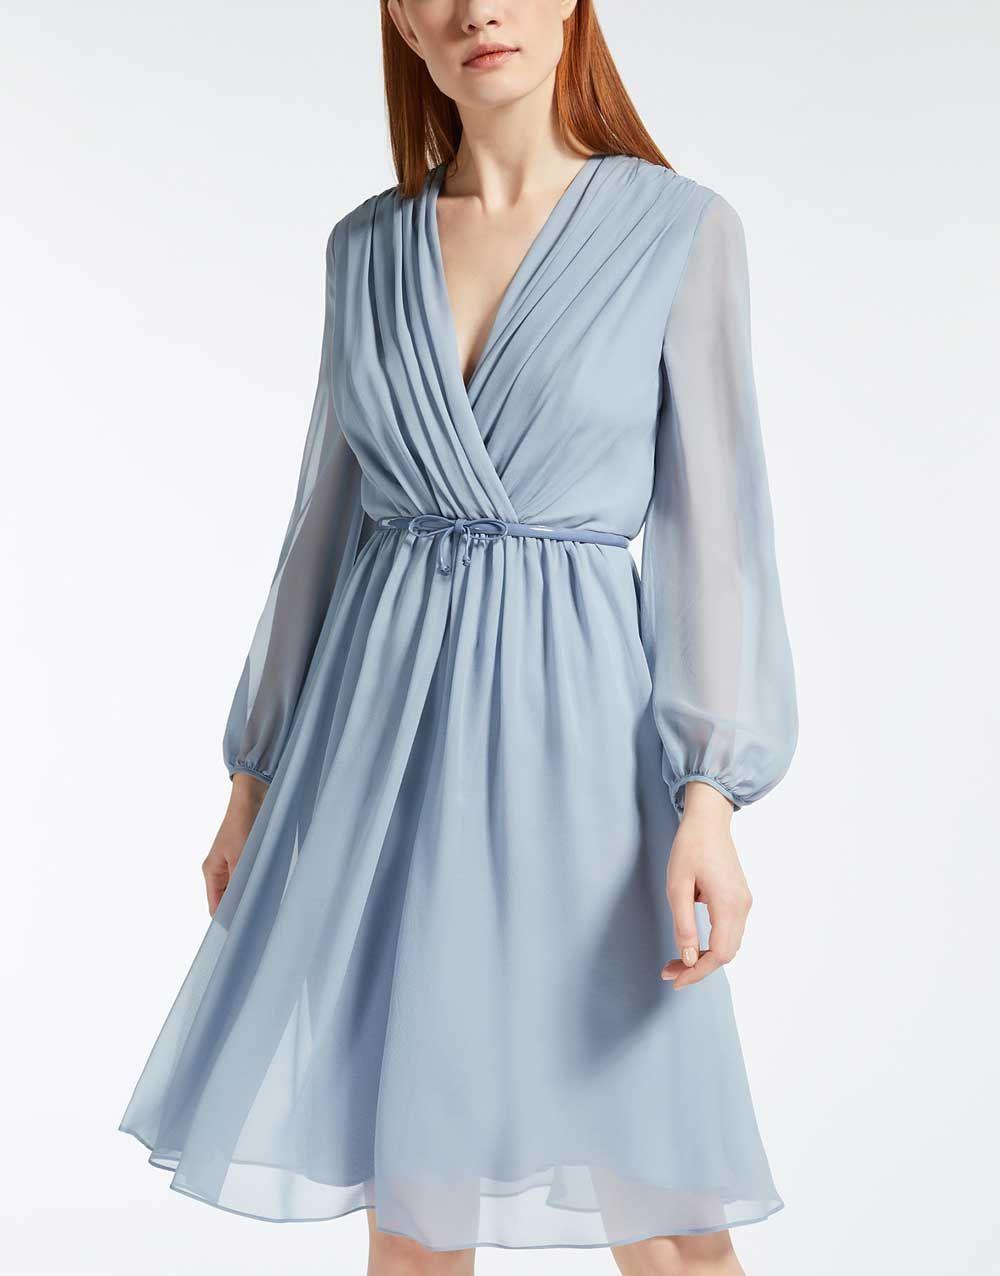 10 Perfekt Max Mara Abendkleid Vertrieb17 Genial Max Mara Abendkleid Vertrieb